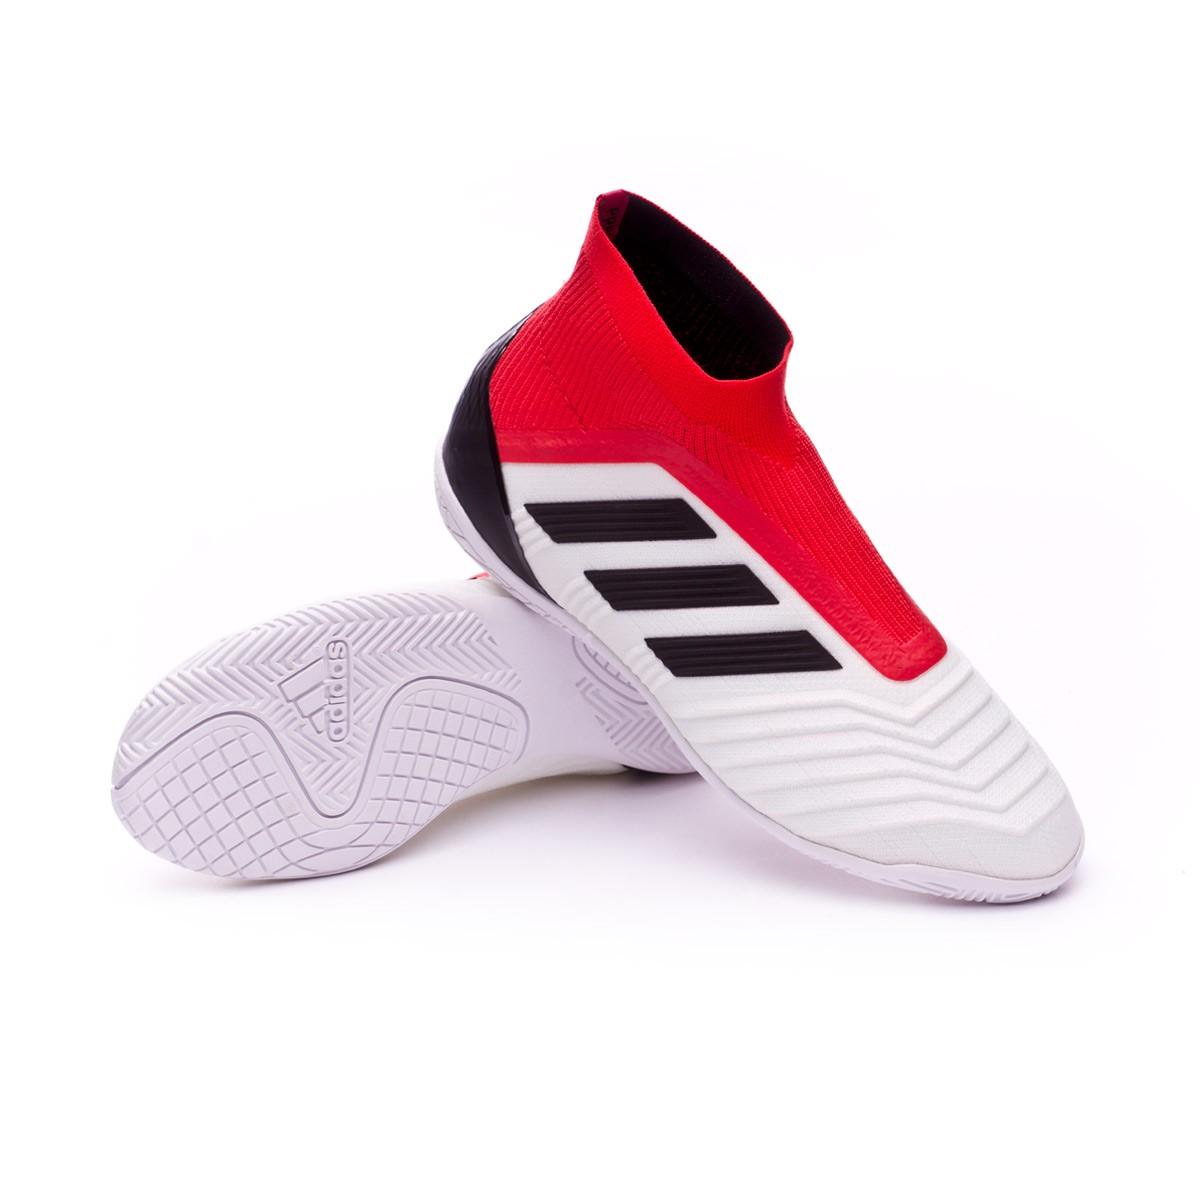 77689d1ea58 Sapatilha de Futsal adidas Predator Tango 18+ IN Crianças White-Core  black-Real coral - Loja de futebol Fútbol Emotion